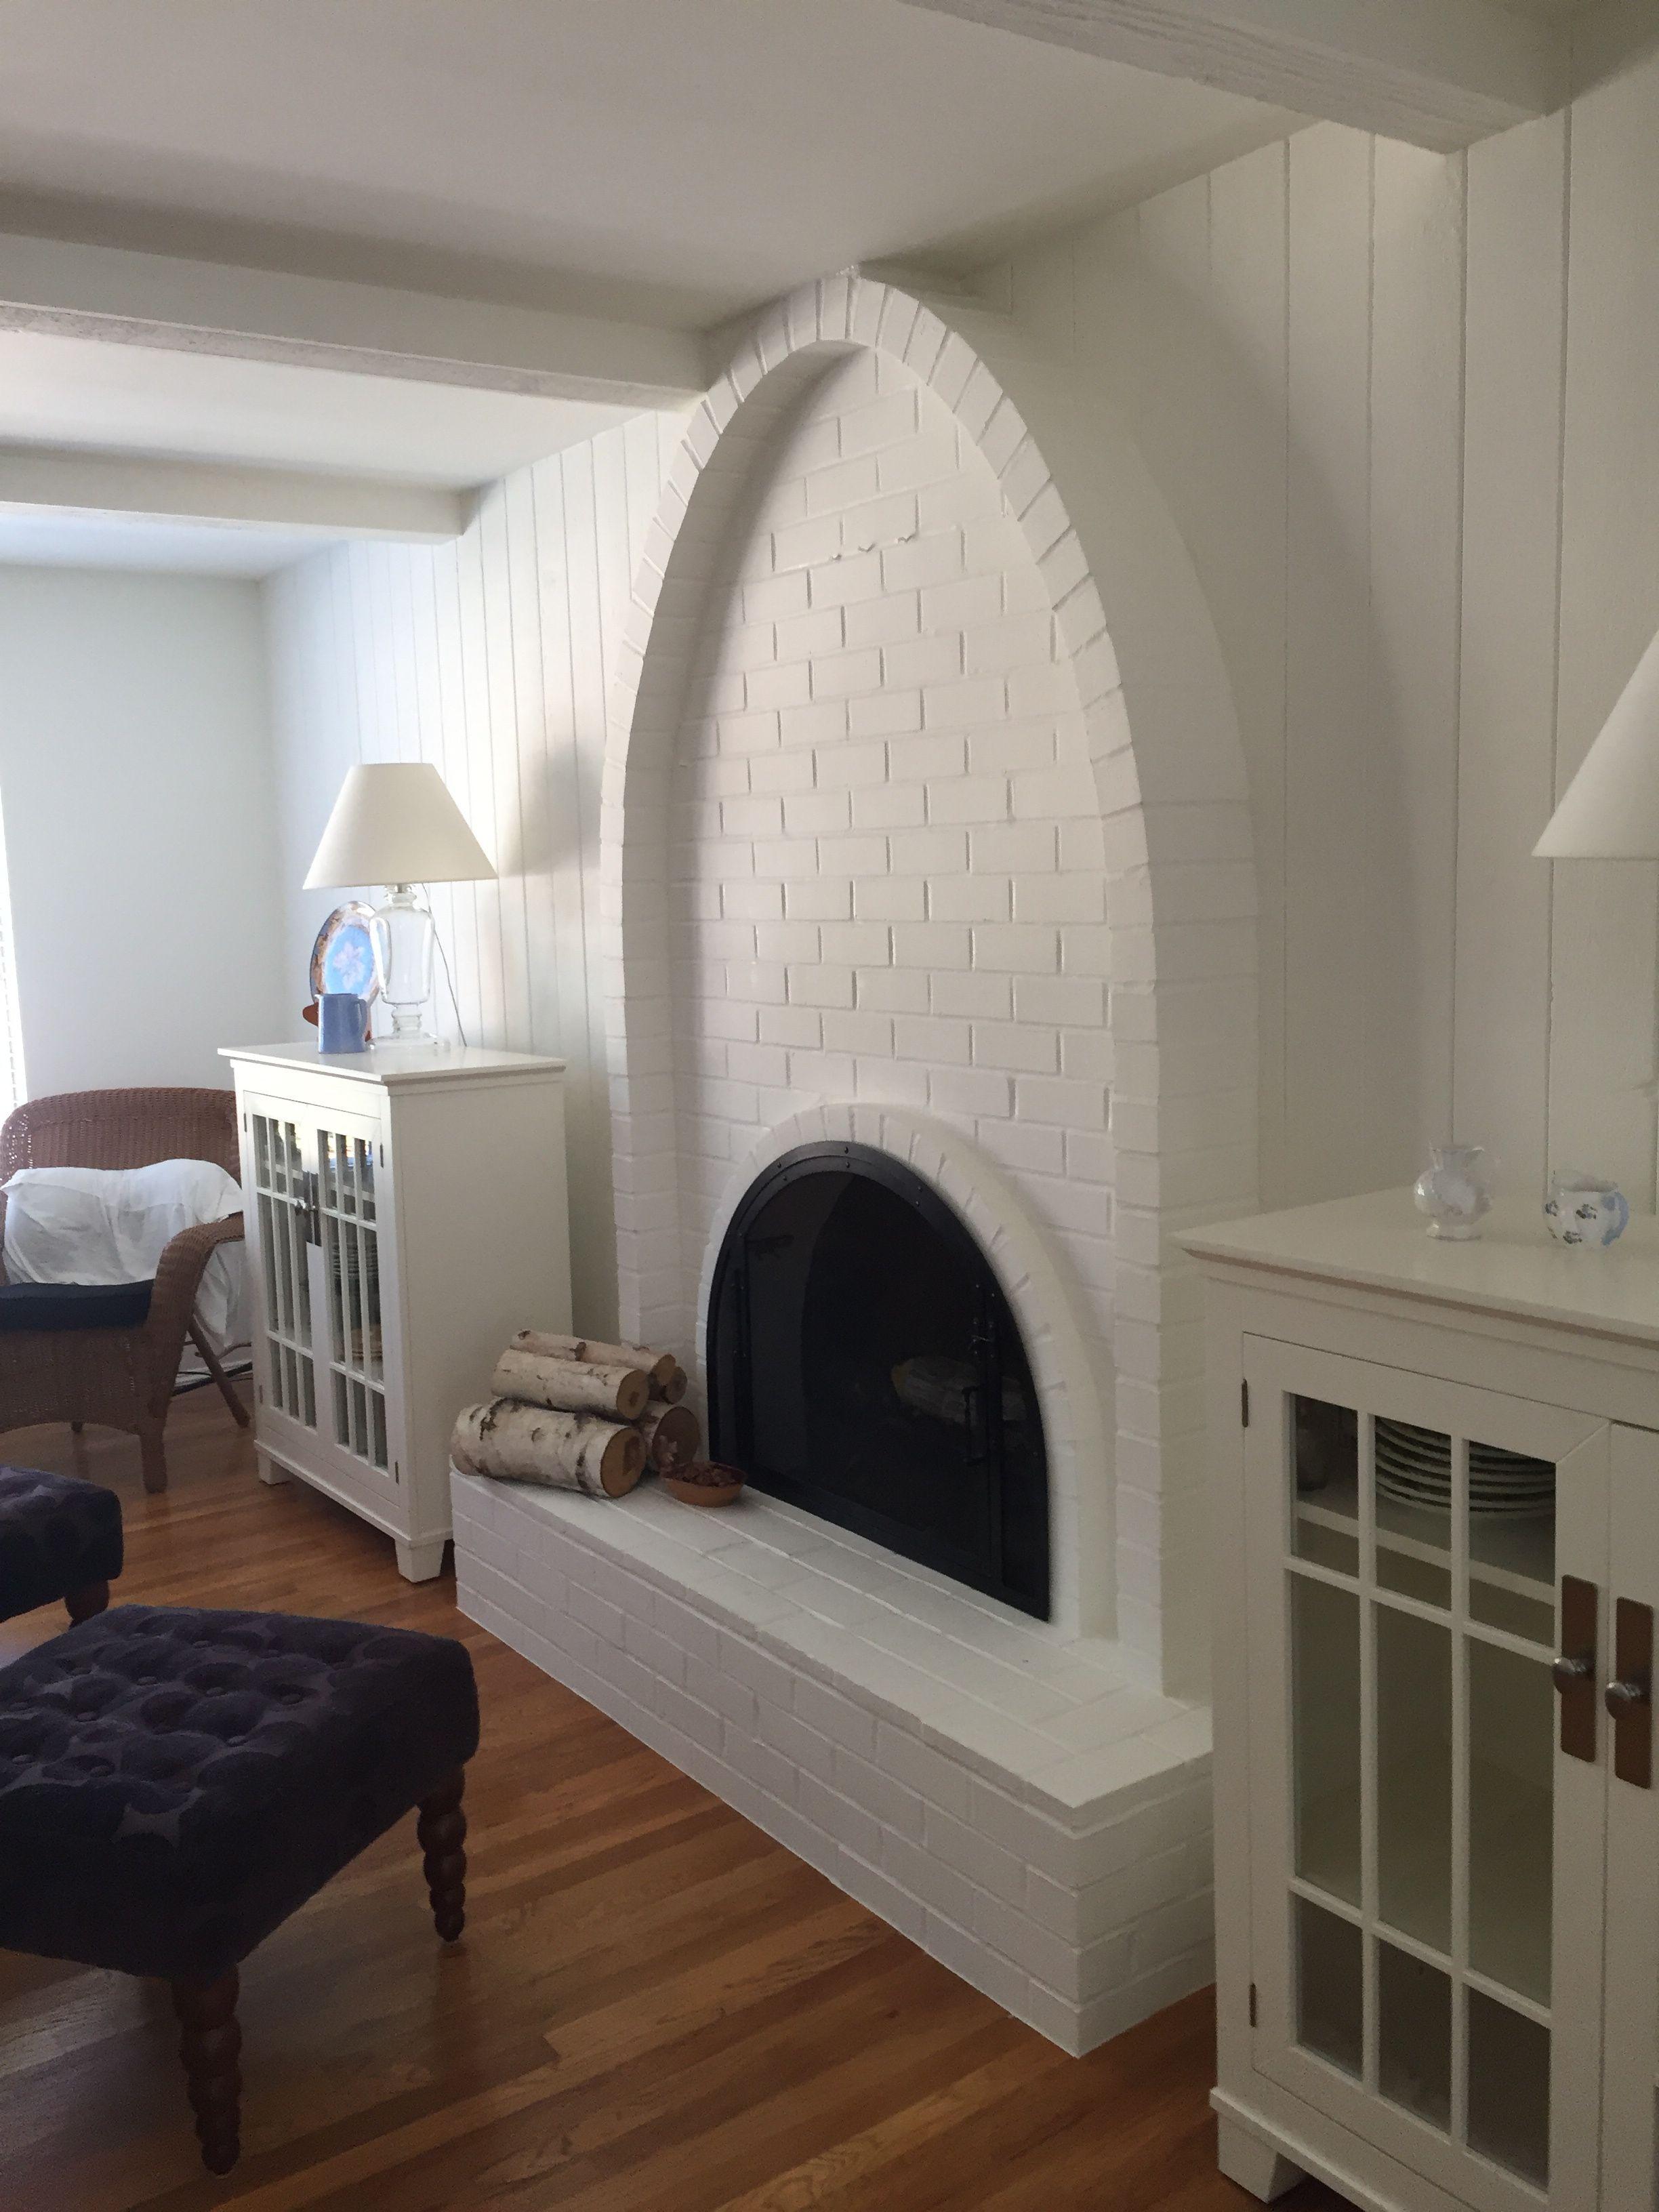 Carol's fireplace